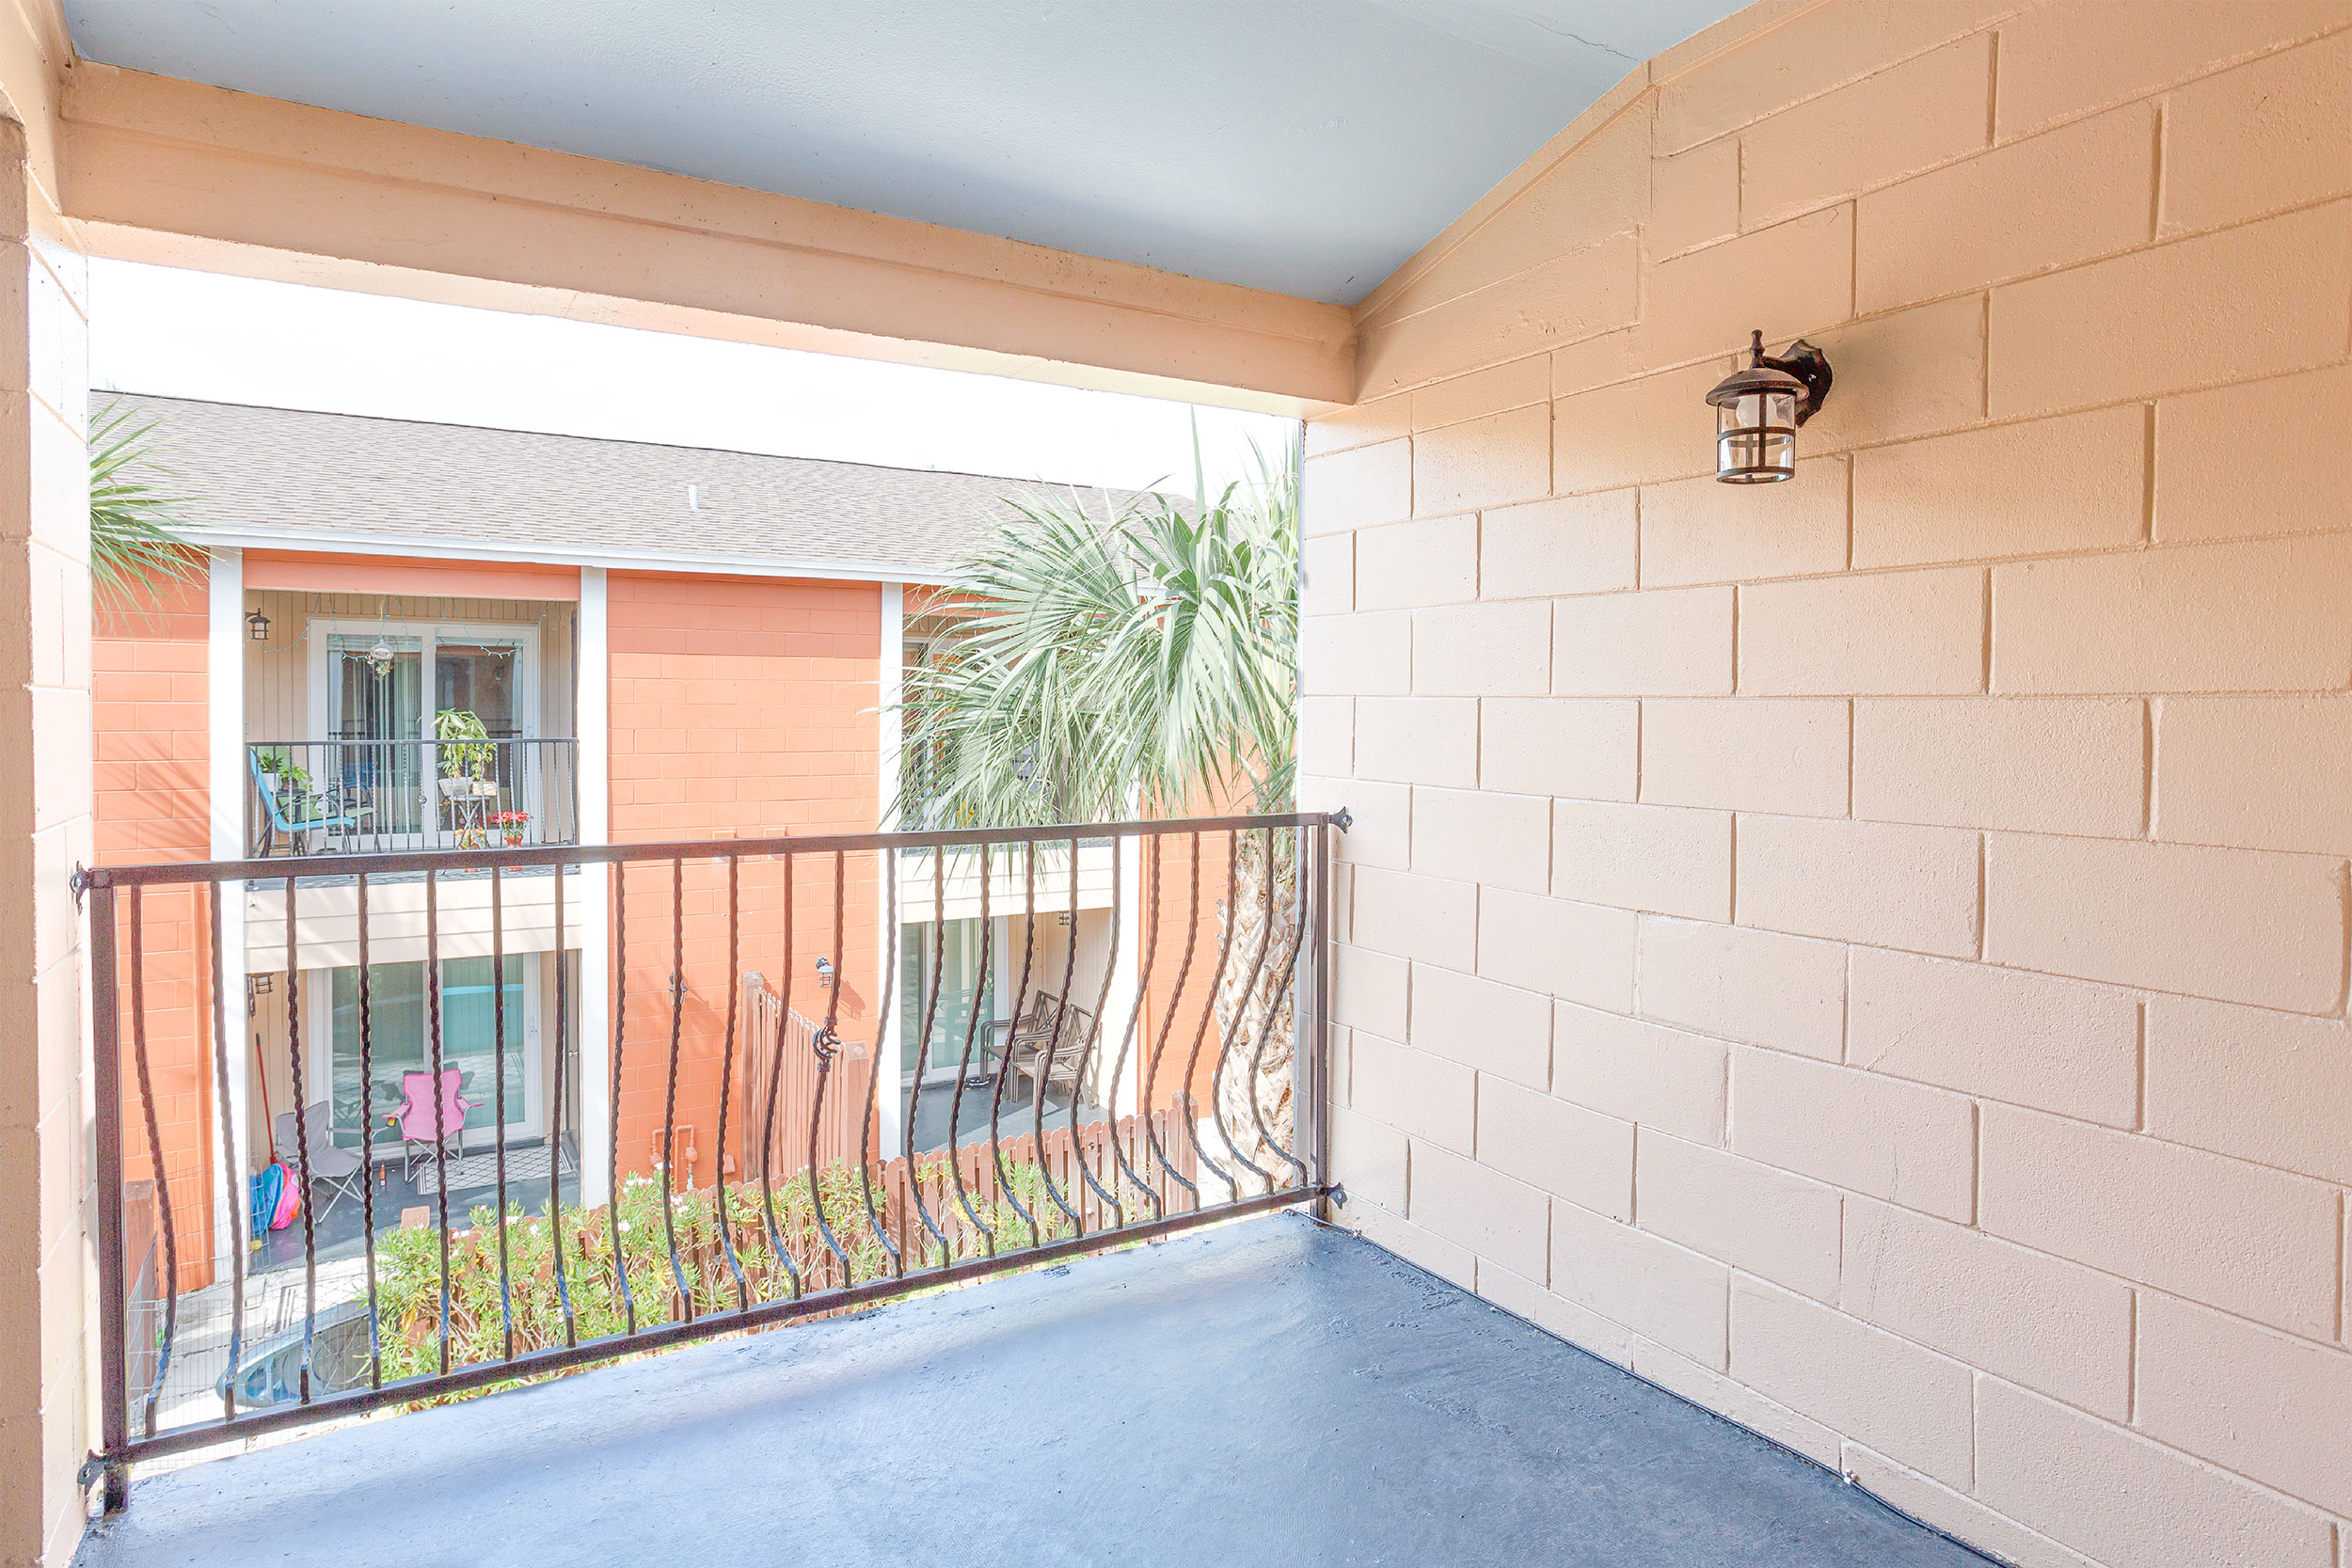 Arb-balcony